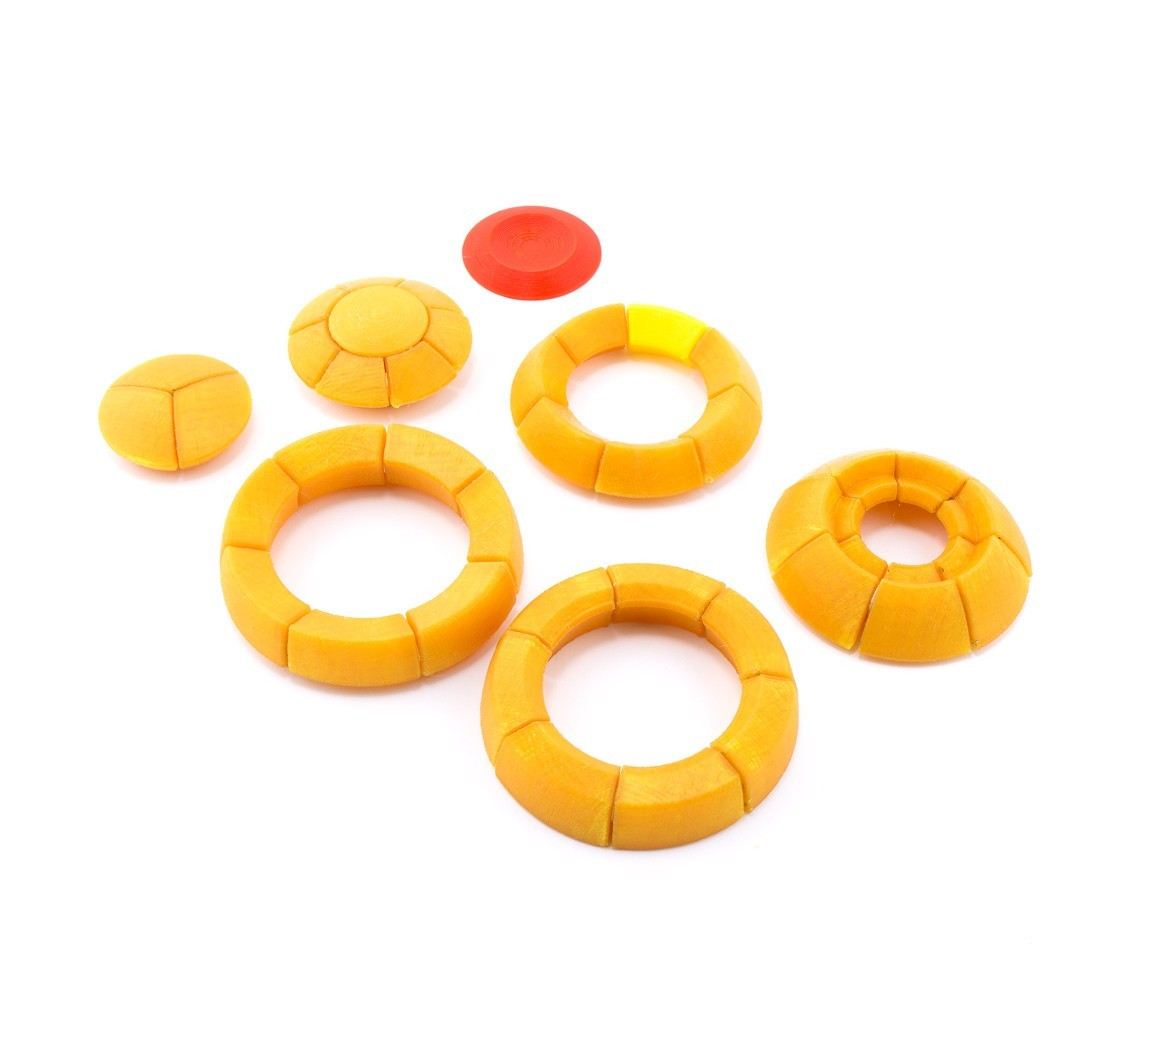 e5ddb792987f86425dde66035338dd90_1449268956187_NMD000653-12.jpg Download free STL file Sphere Builder • 3D printable object, FerryTeacher